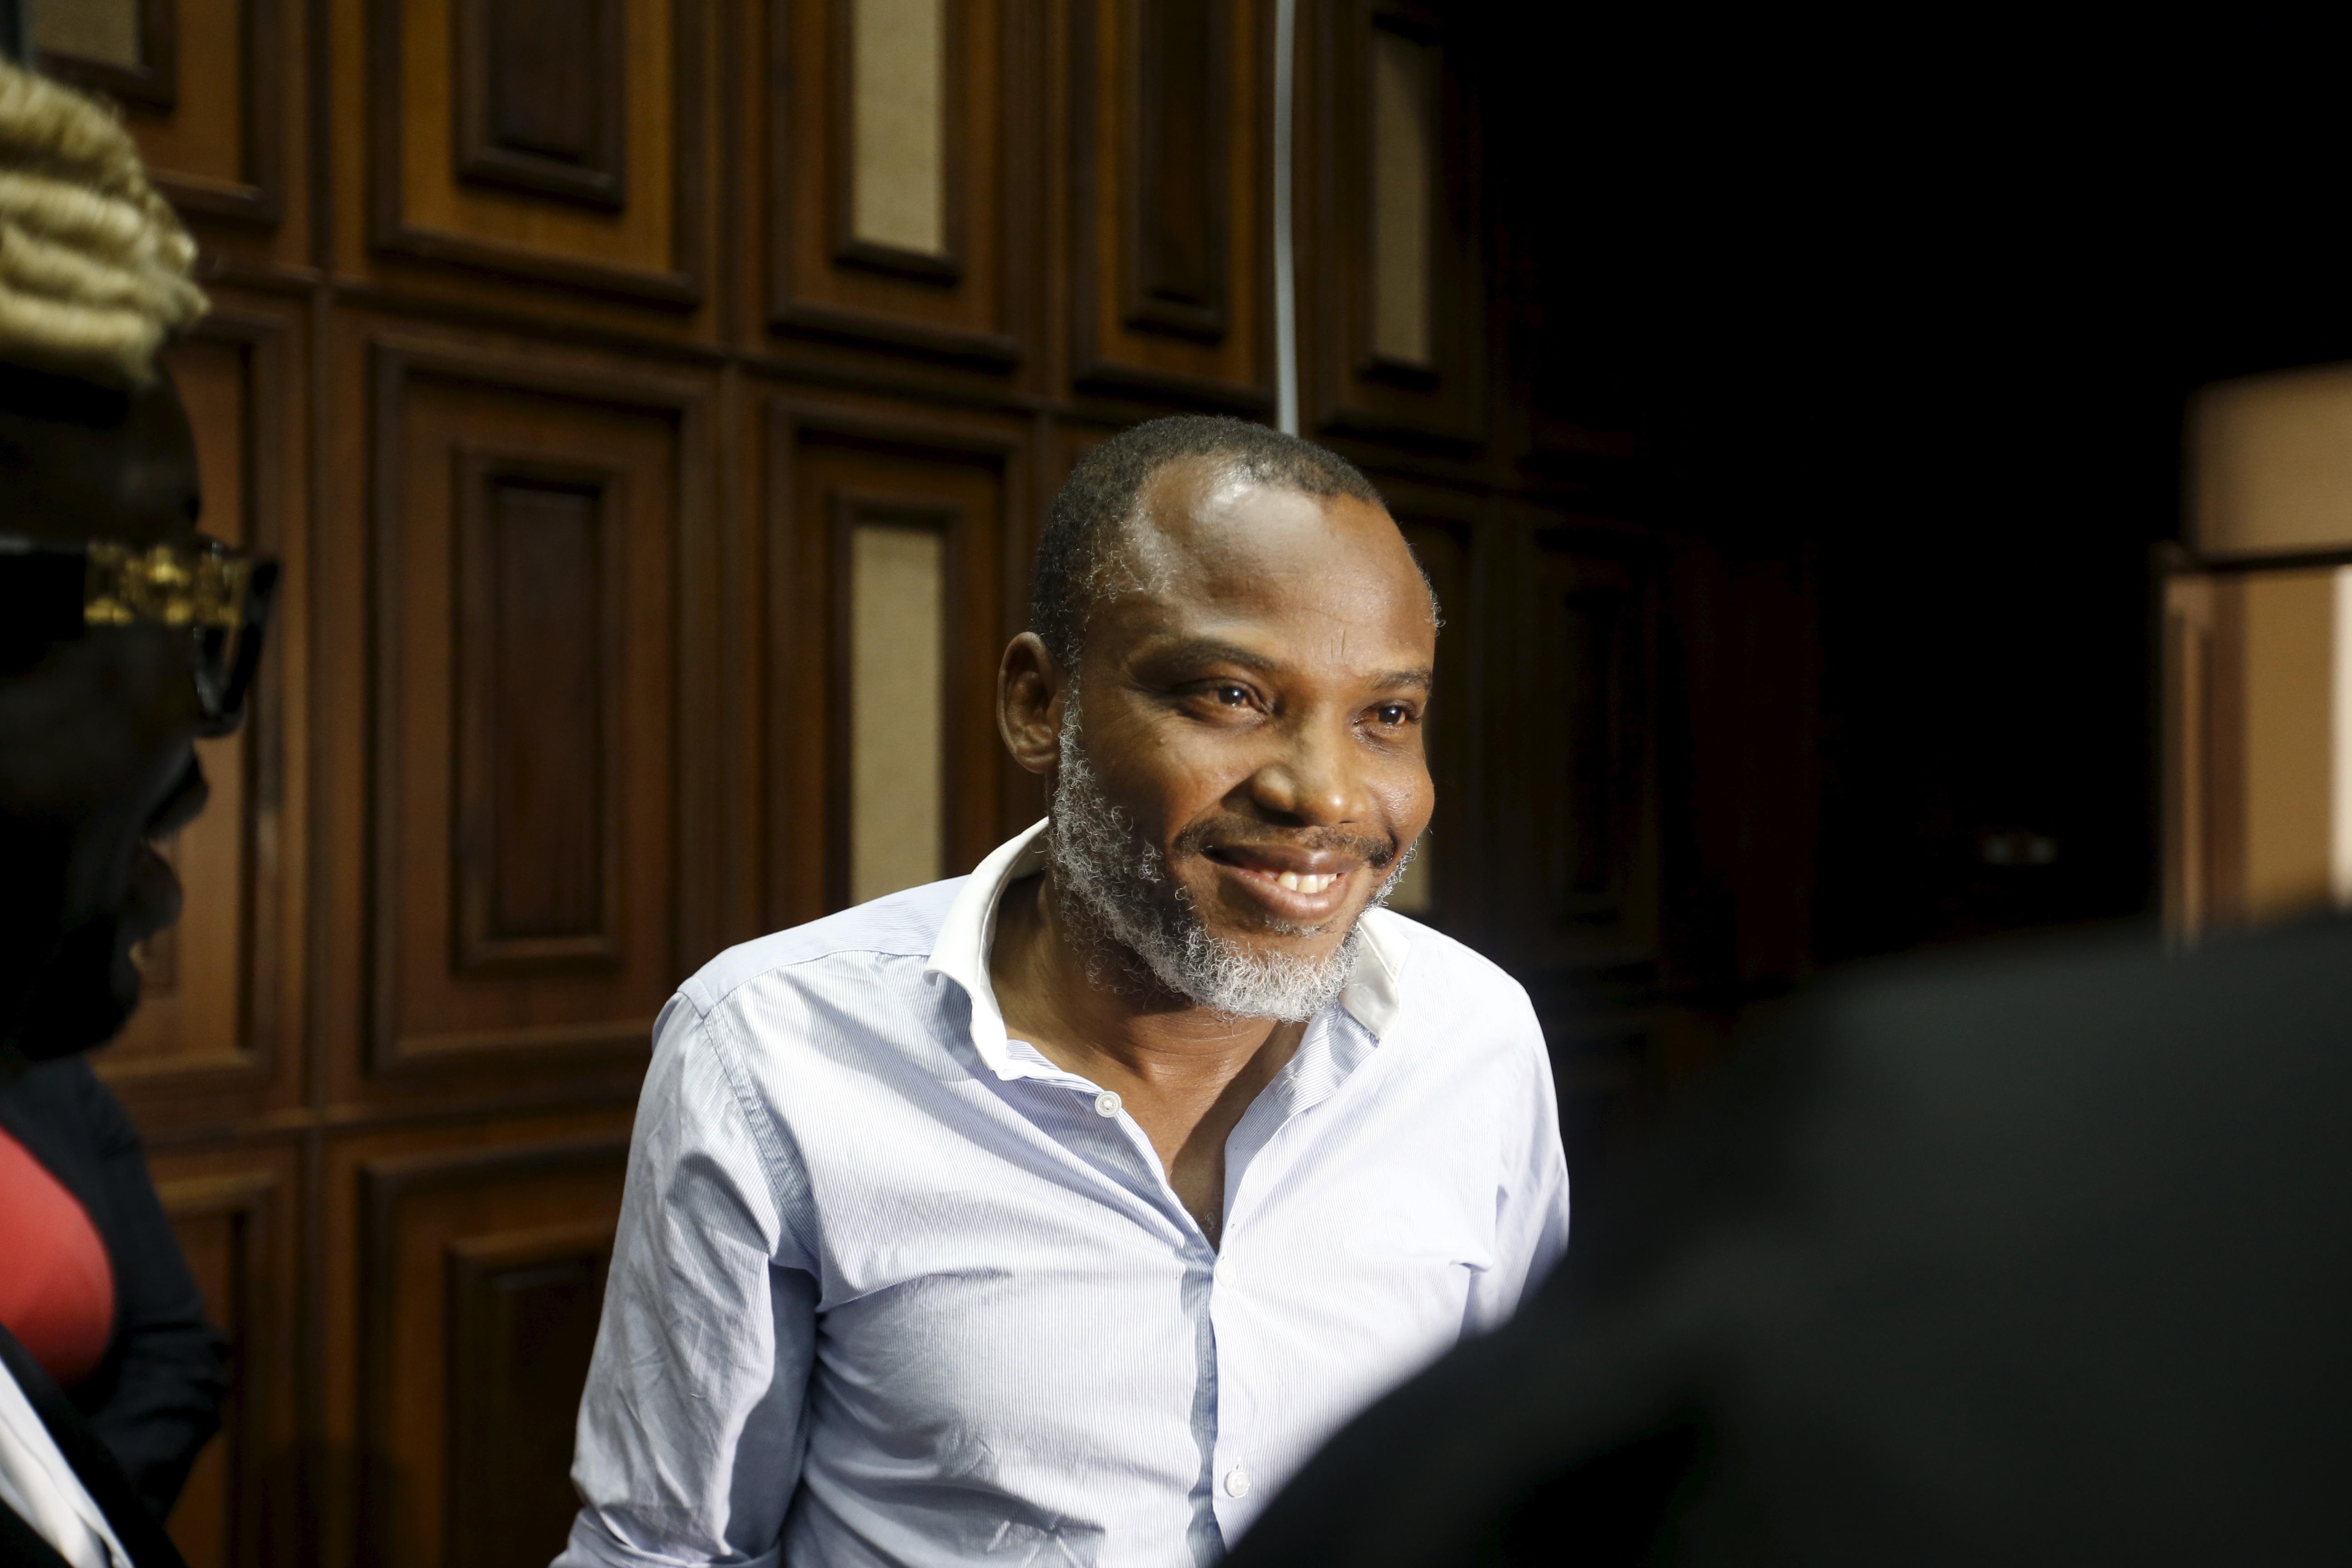 Biafran separatist leader Nnamdi Kanu arrested and will face tria